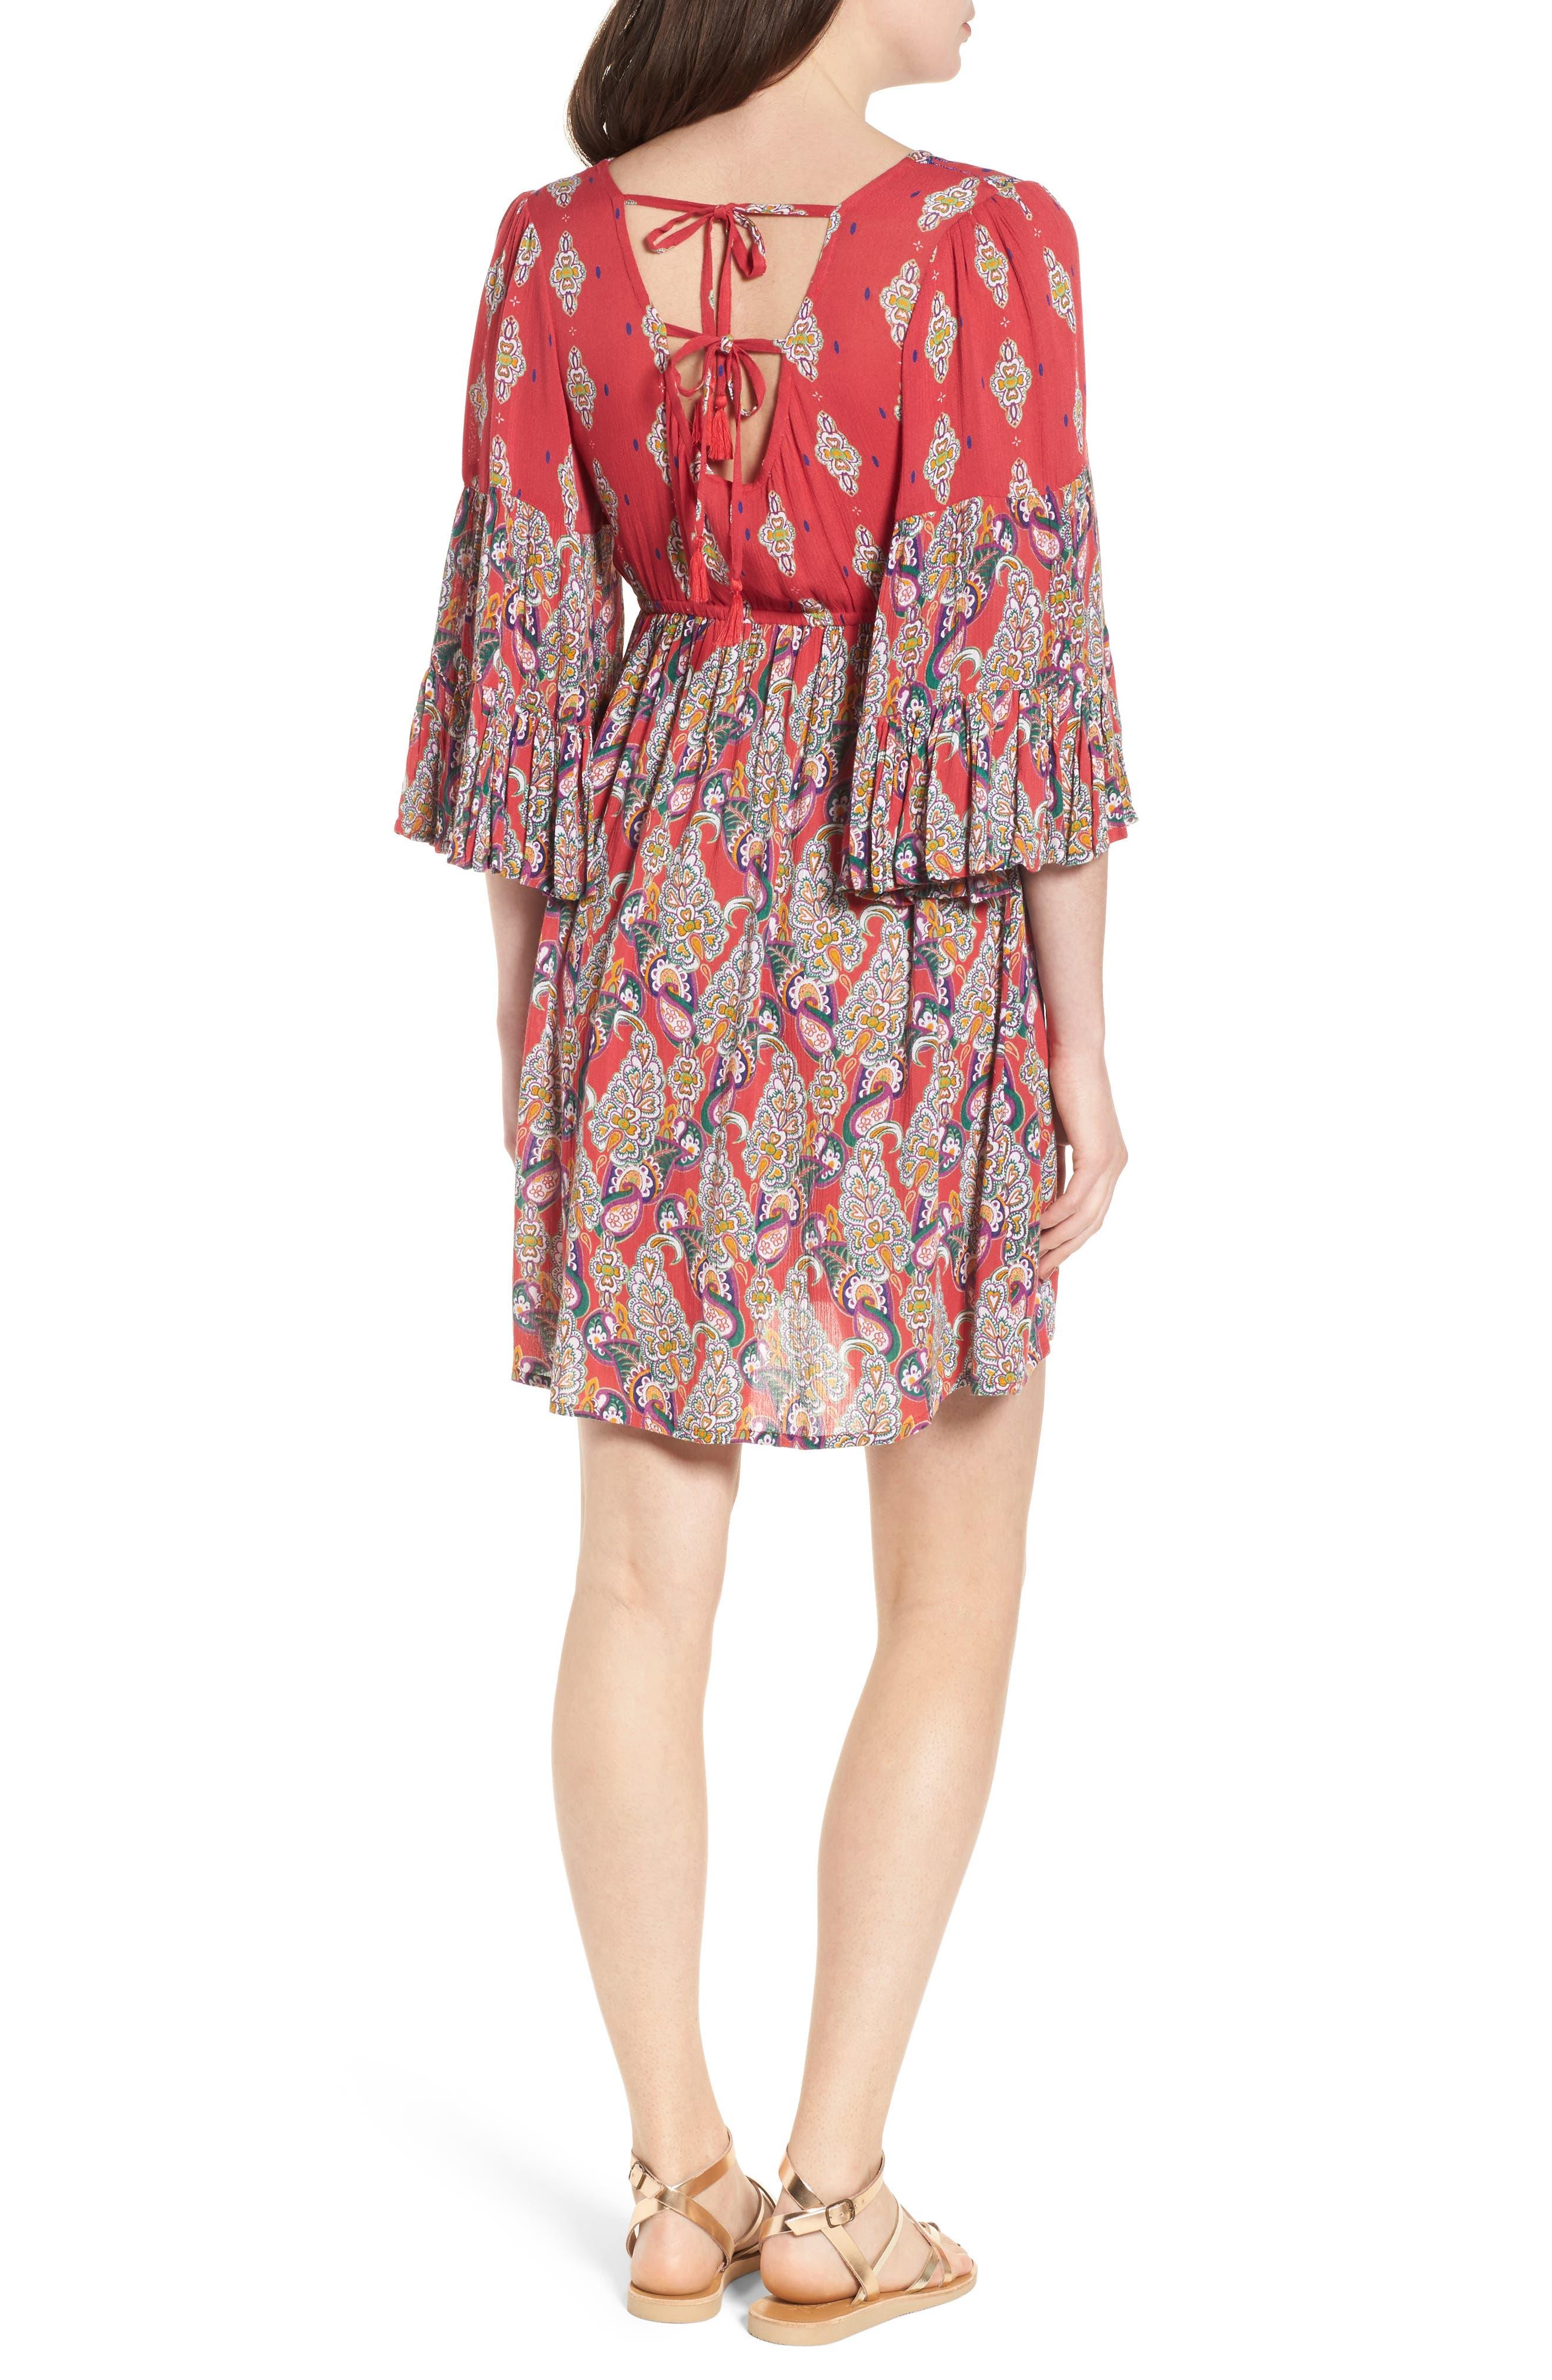 Alice Bell Sleeve Babydoll Dress,                             Alternate thumbnail 2, color,                             645